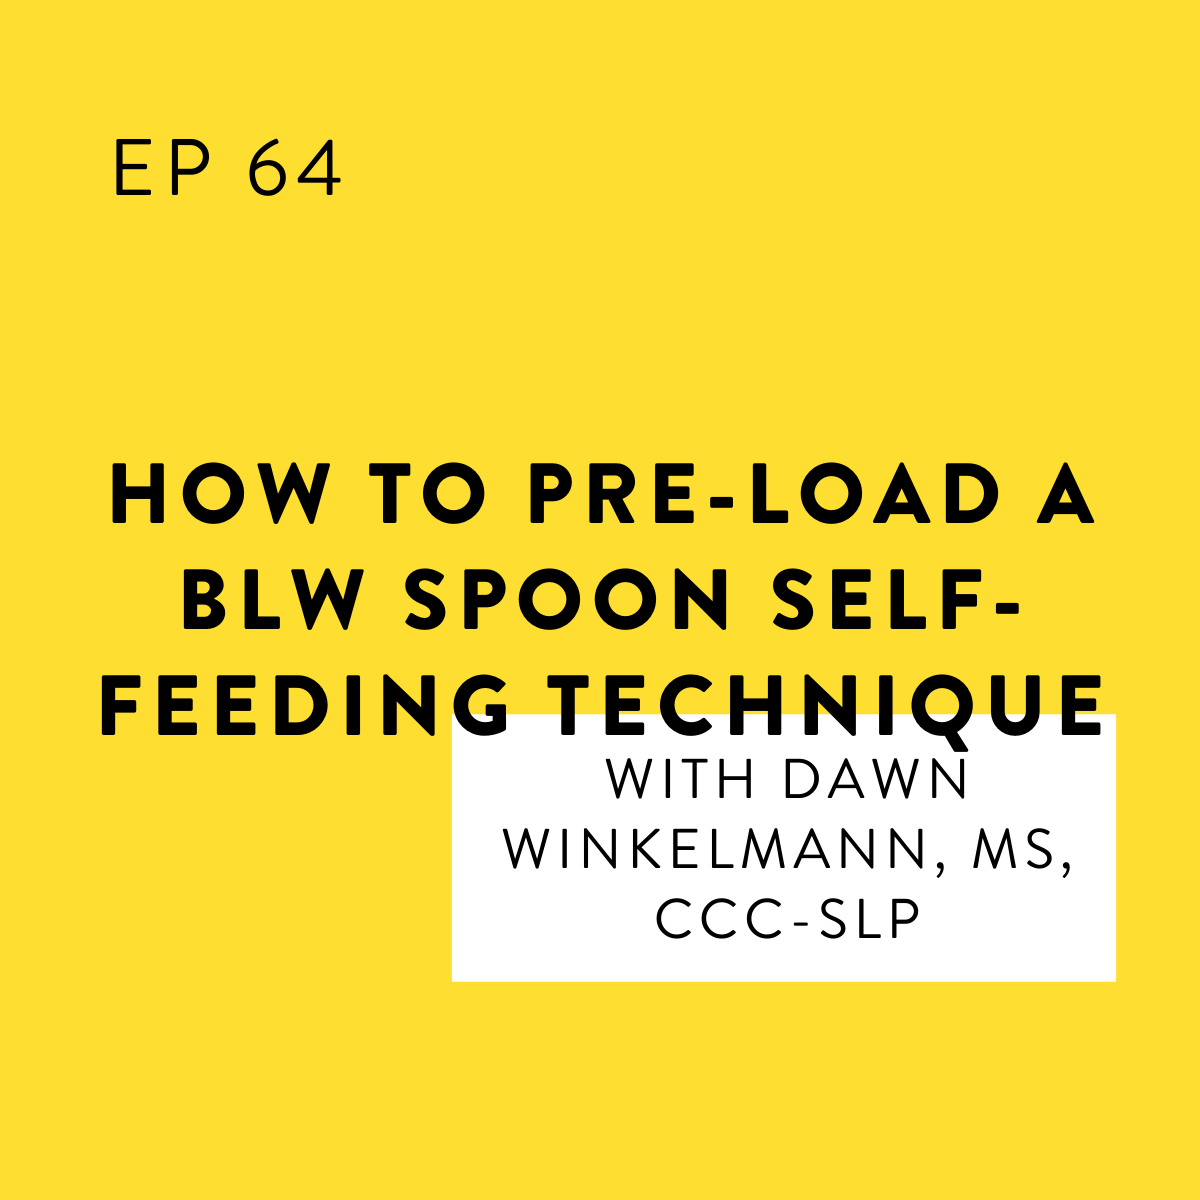 How to Pre-Load a BLW Spoon: Self-Feeding Technique with Dawn Winkelmann, MS, CCC-SLP